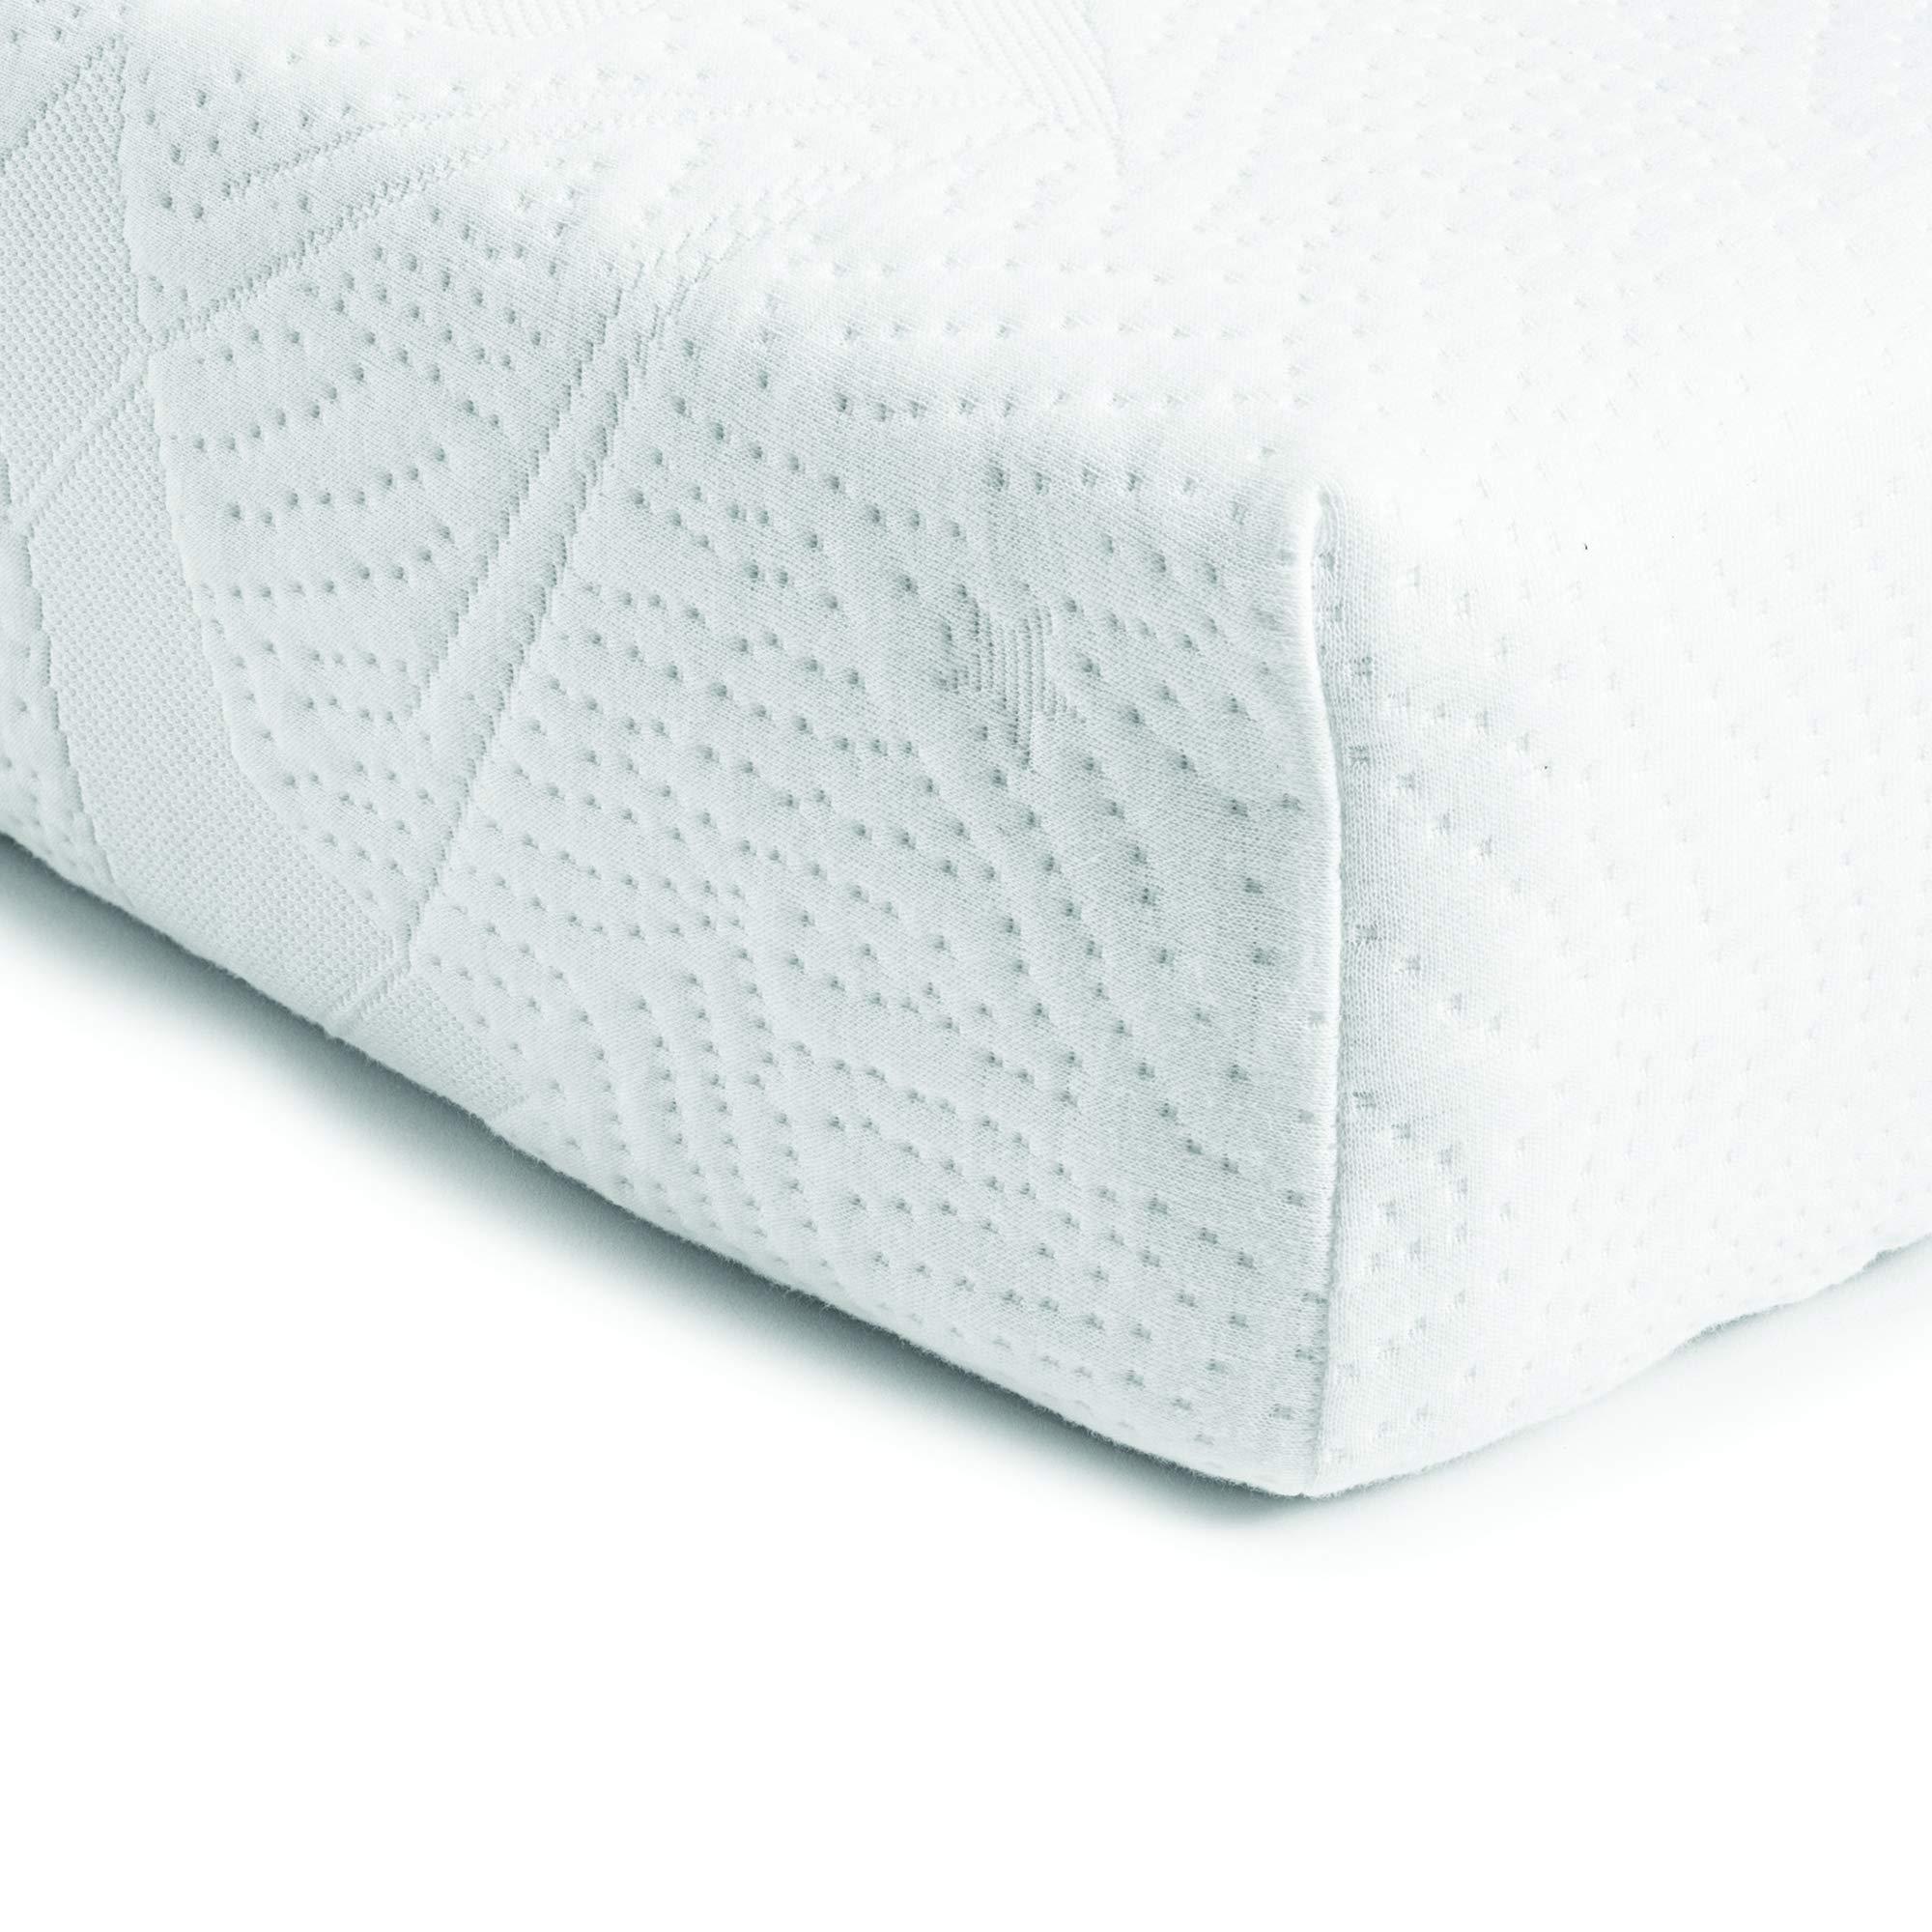 Bundle of Dreams Mini Hypoallergenic Organic Baby Crib Water Repellent Mattress Cover, 5-Inch